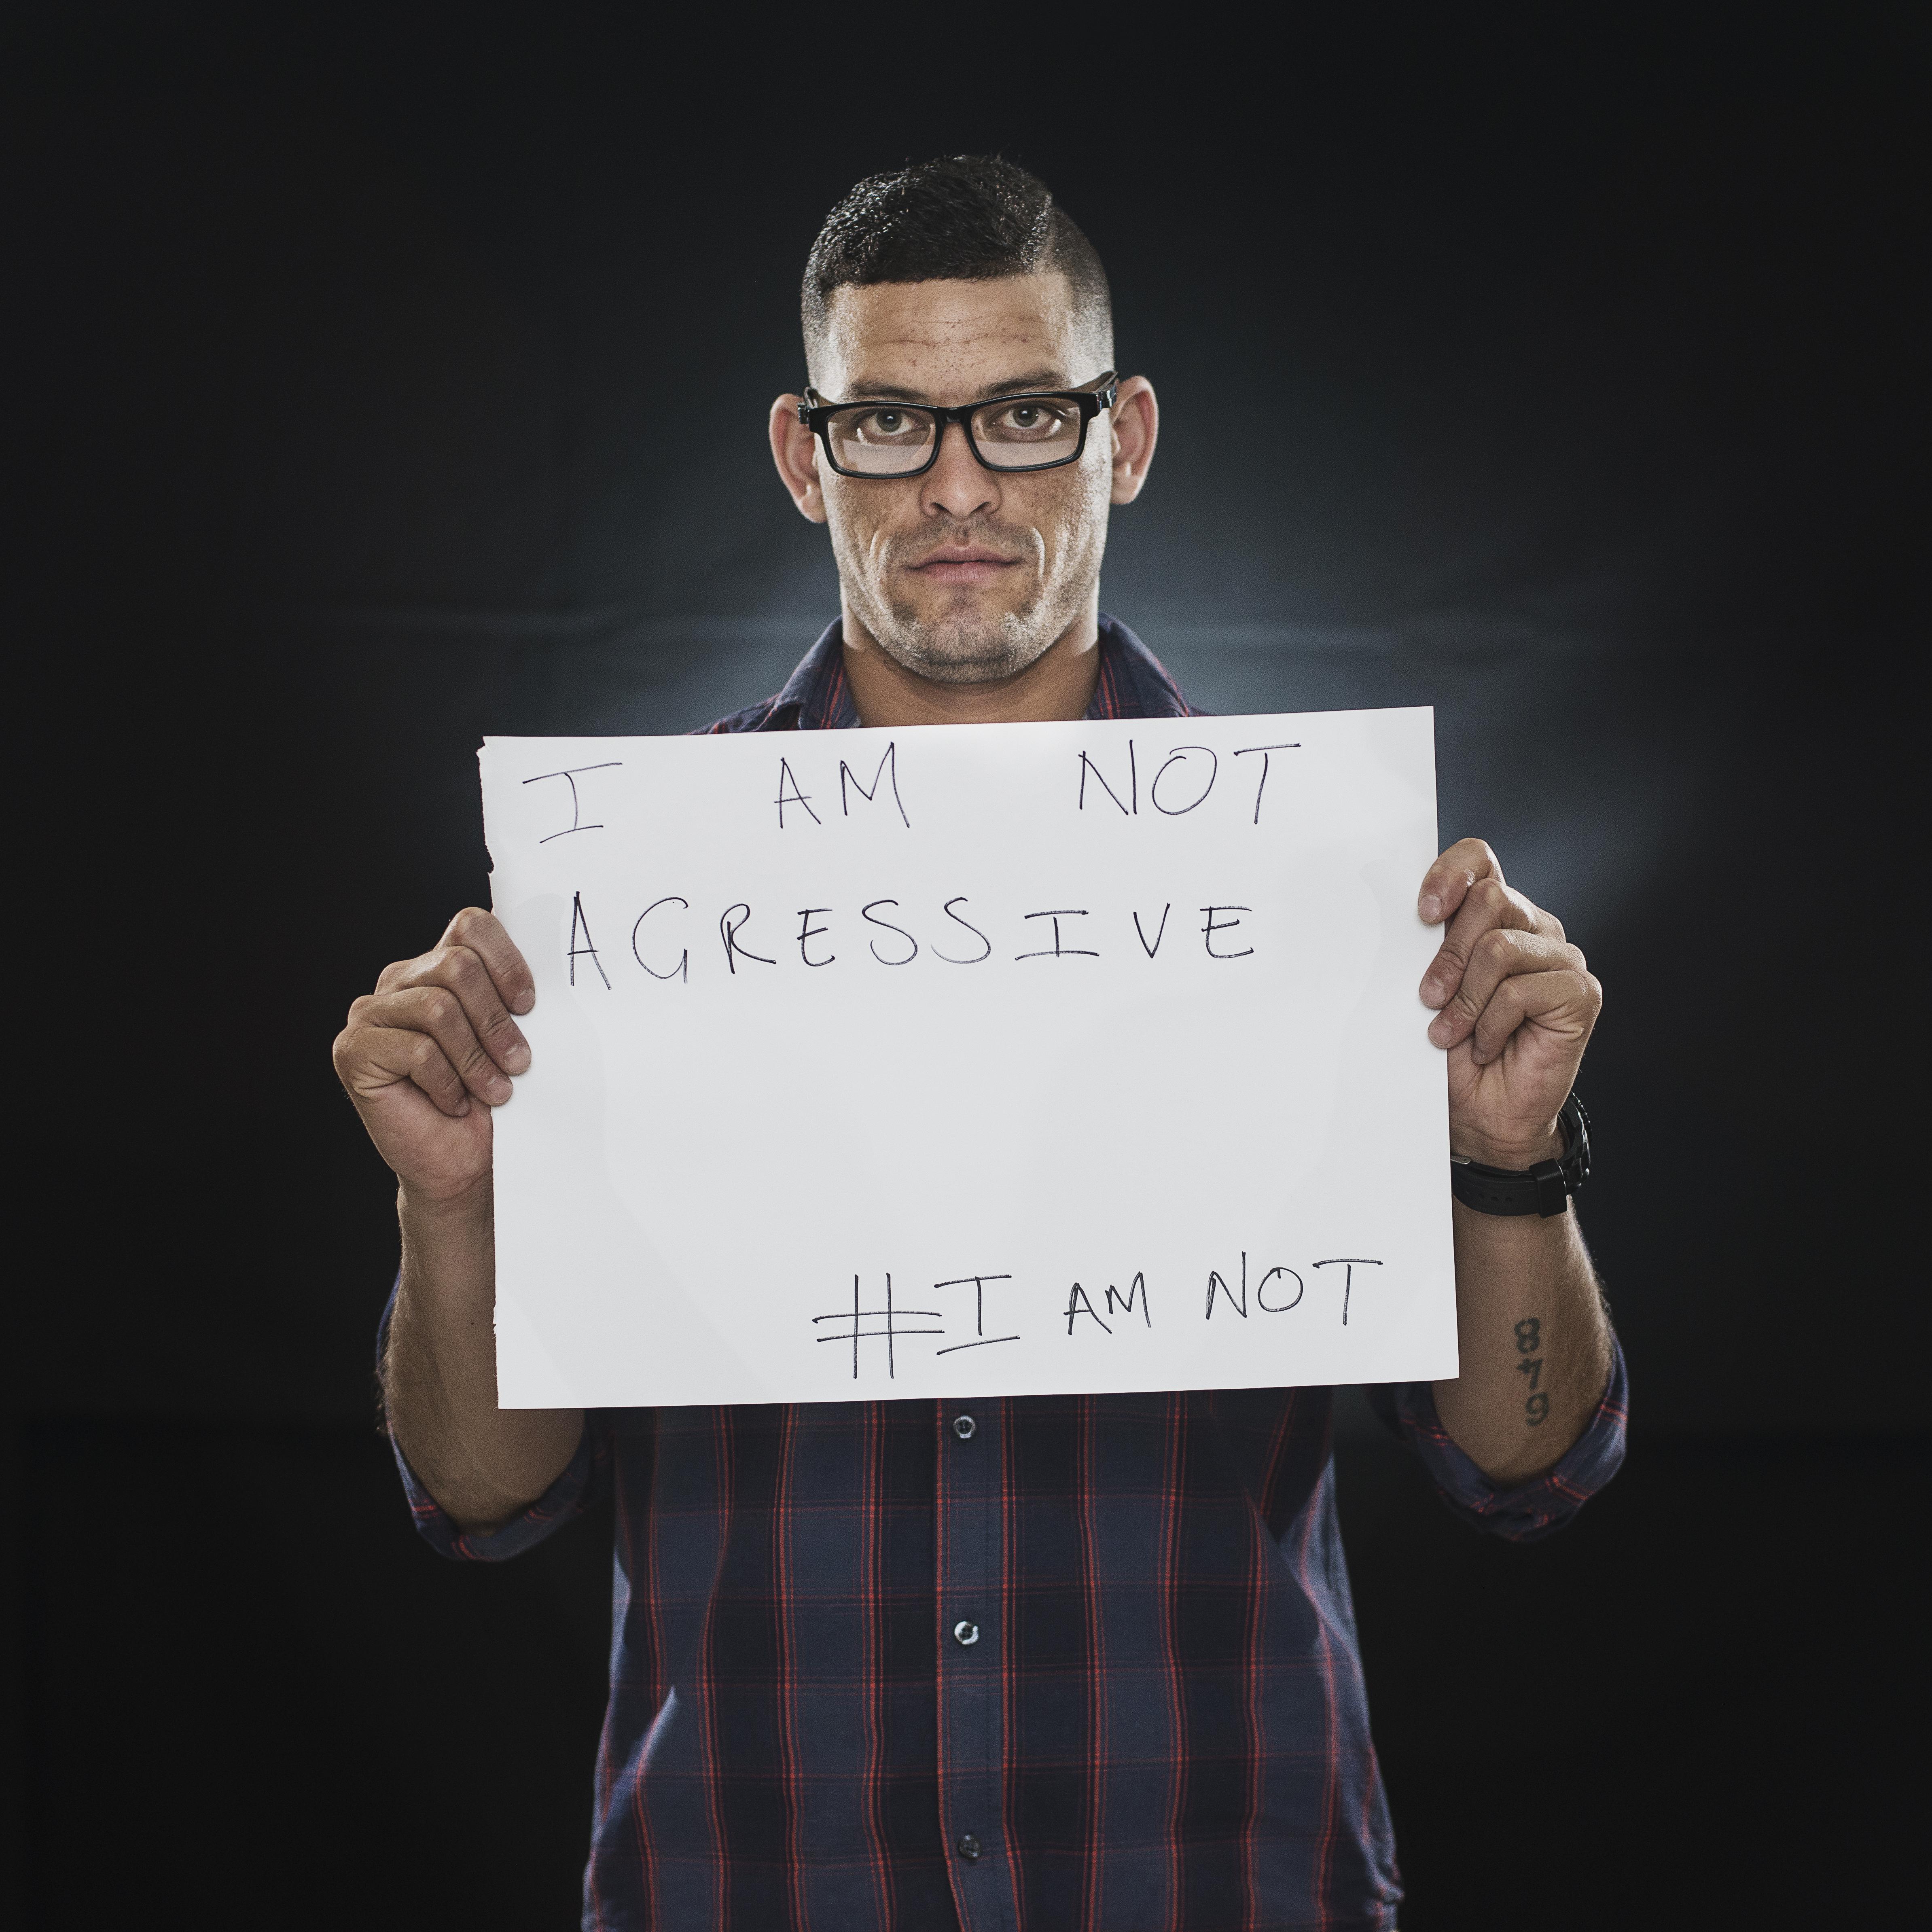 #Imnot aggressive